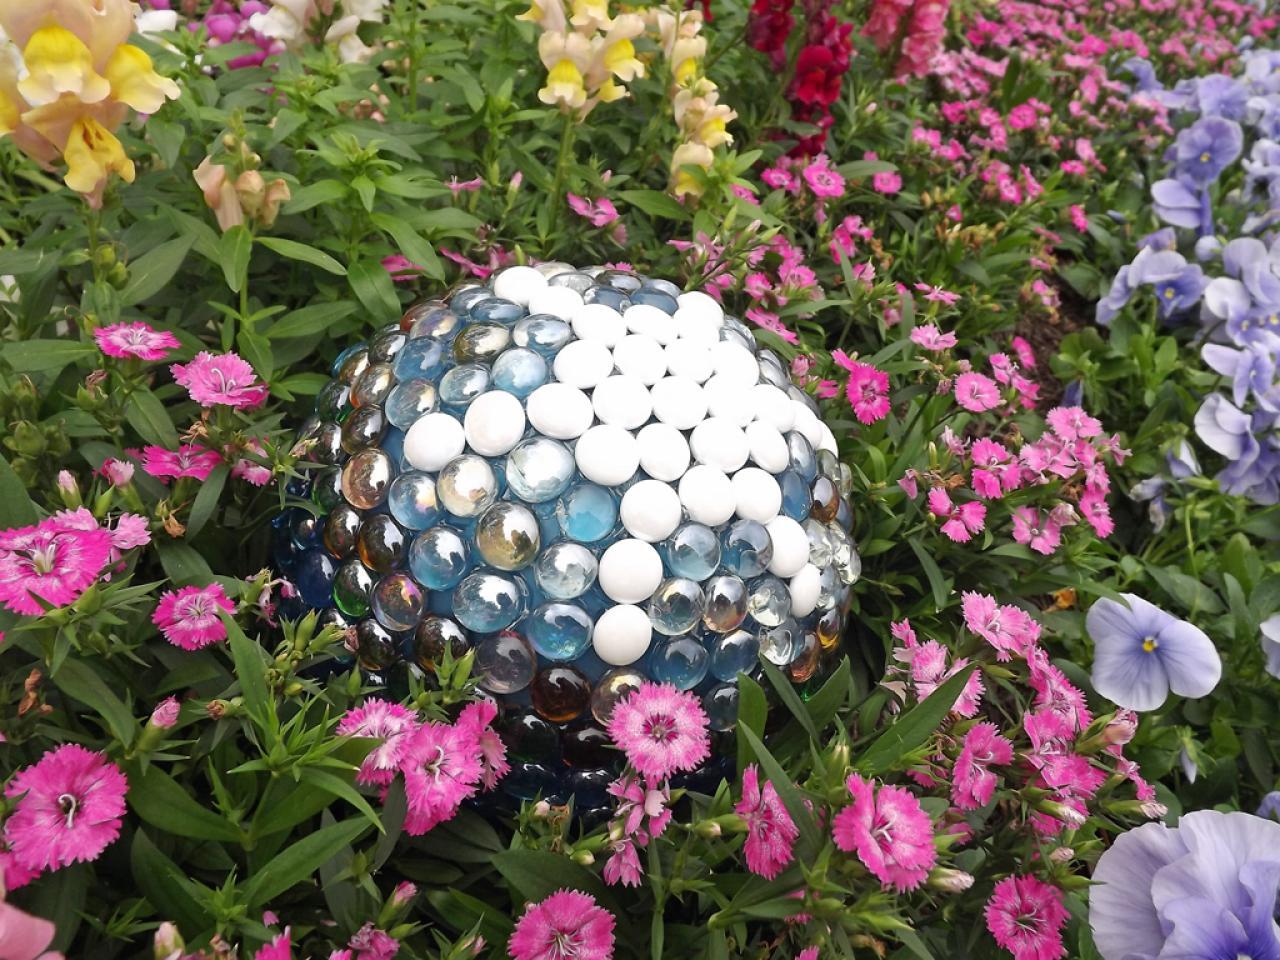 Captivating Garden Ball